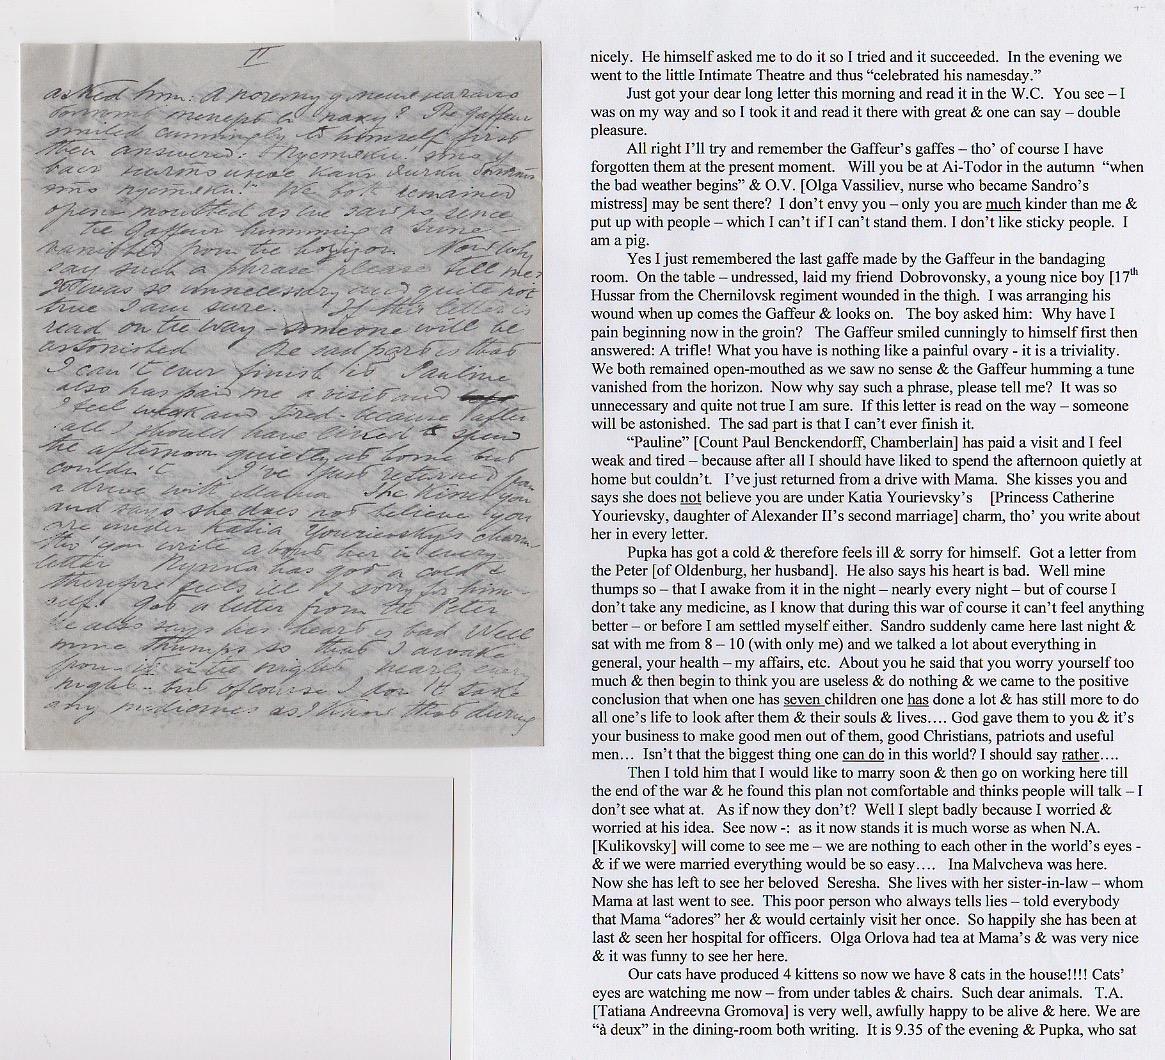 Royalty Grand Duchess Olga Correspondence To Her Sister Grand Duchess Xenia 1916-1920 - Image 20 of 47